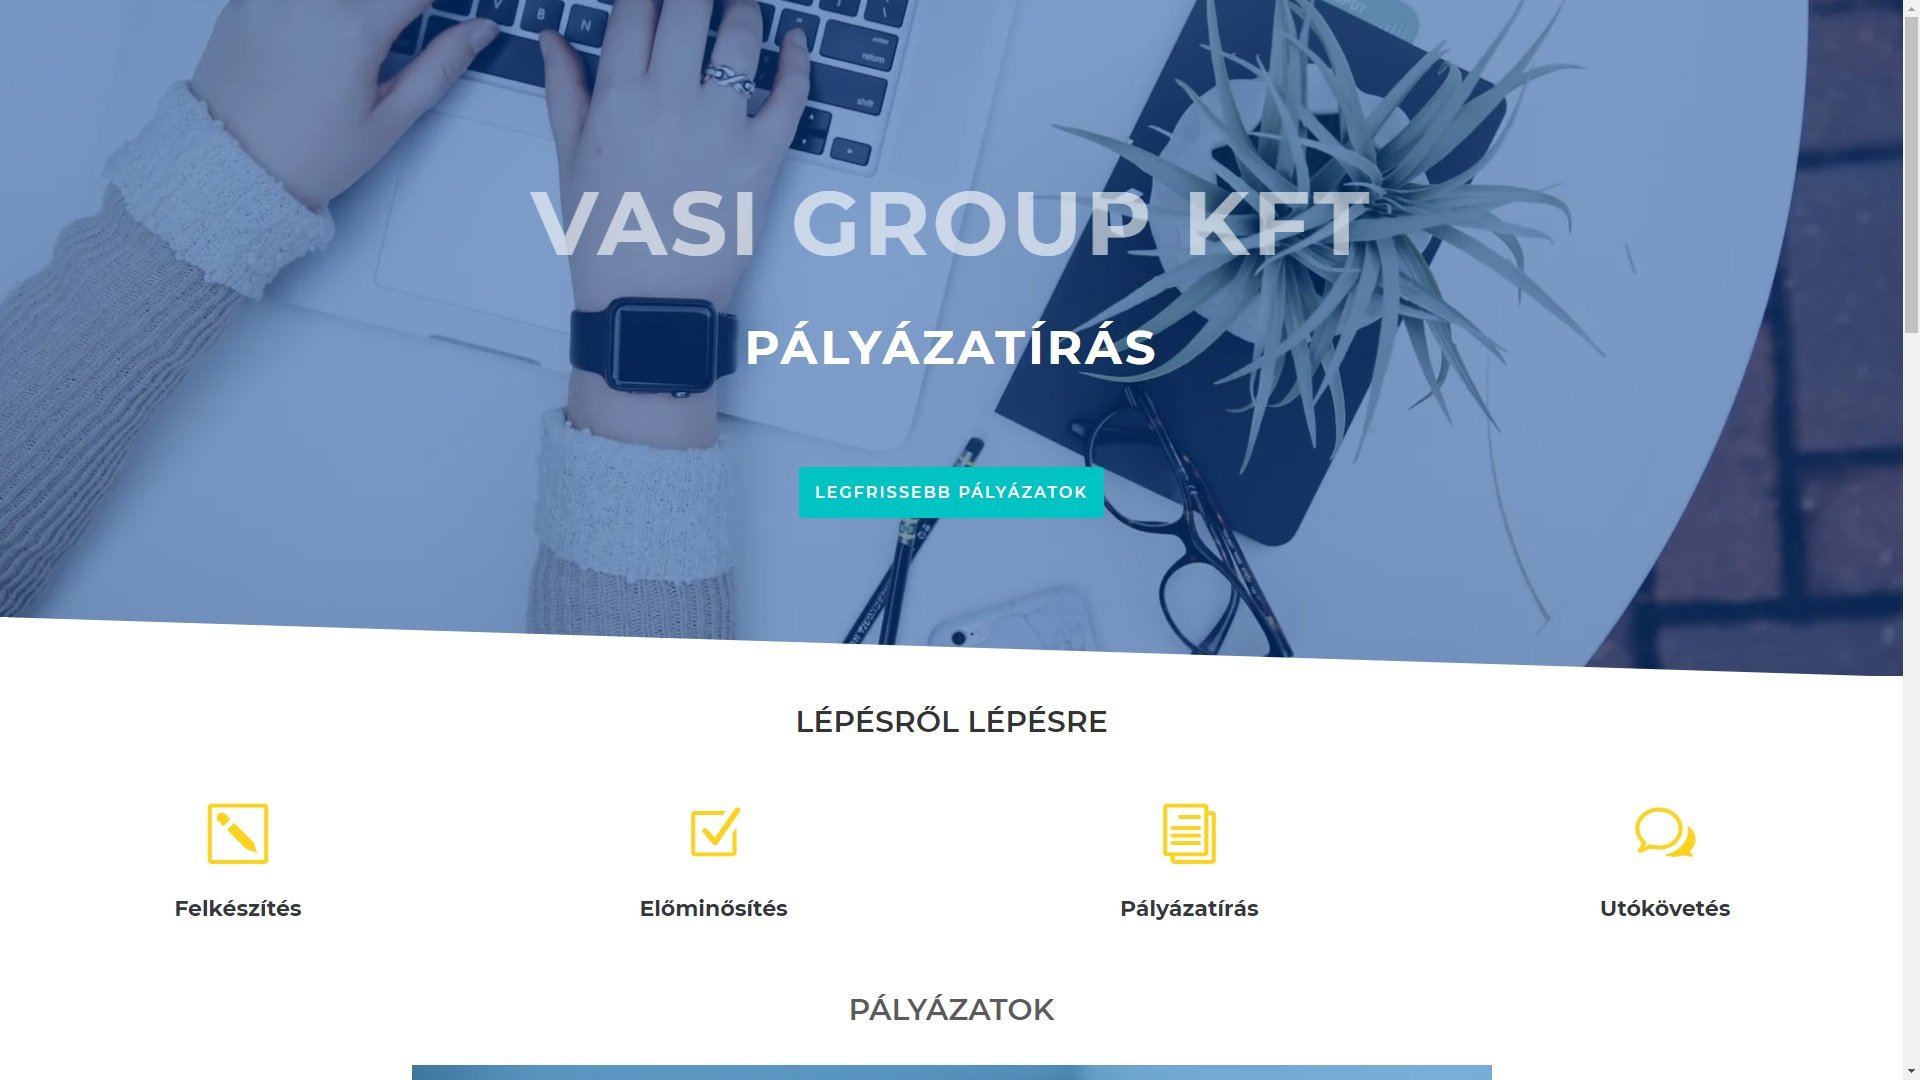 Vasi Group Kft